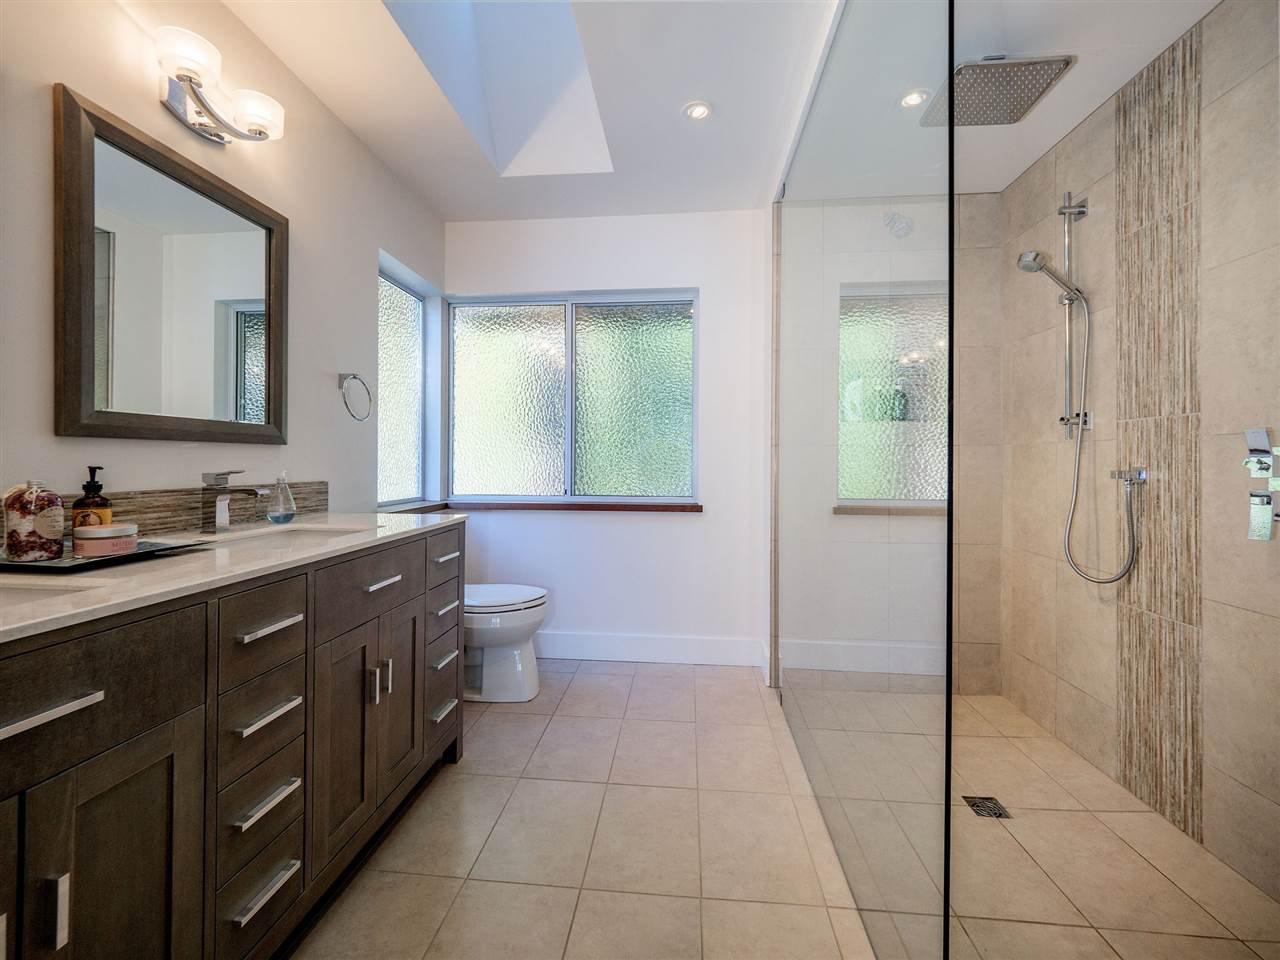 "Photo 25: Photos: 7101 DALE Road in Sechelt: Sechelt District House for sale in ""Caleda Estates"" (Sunshine Coast)  : MLS®# R2515160"